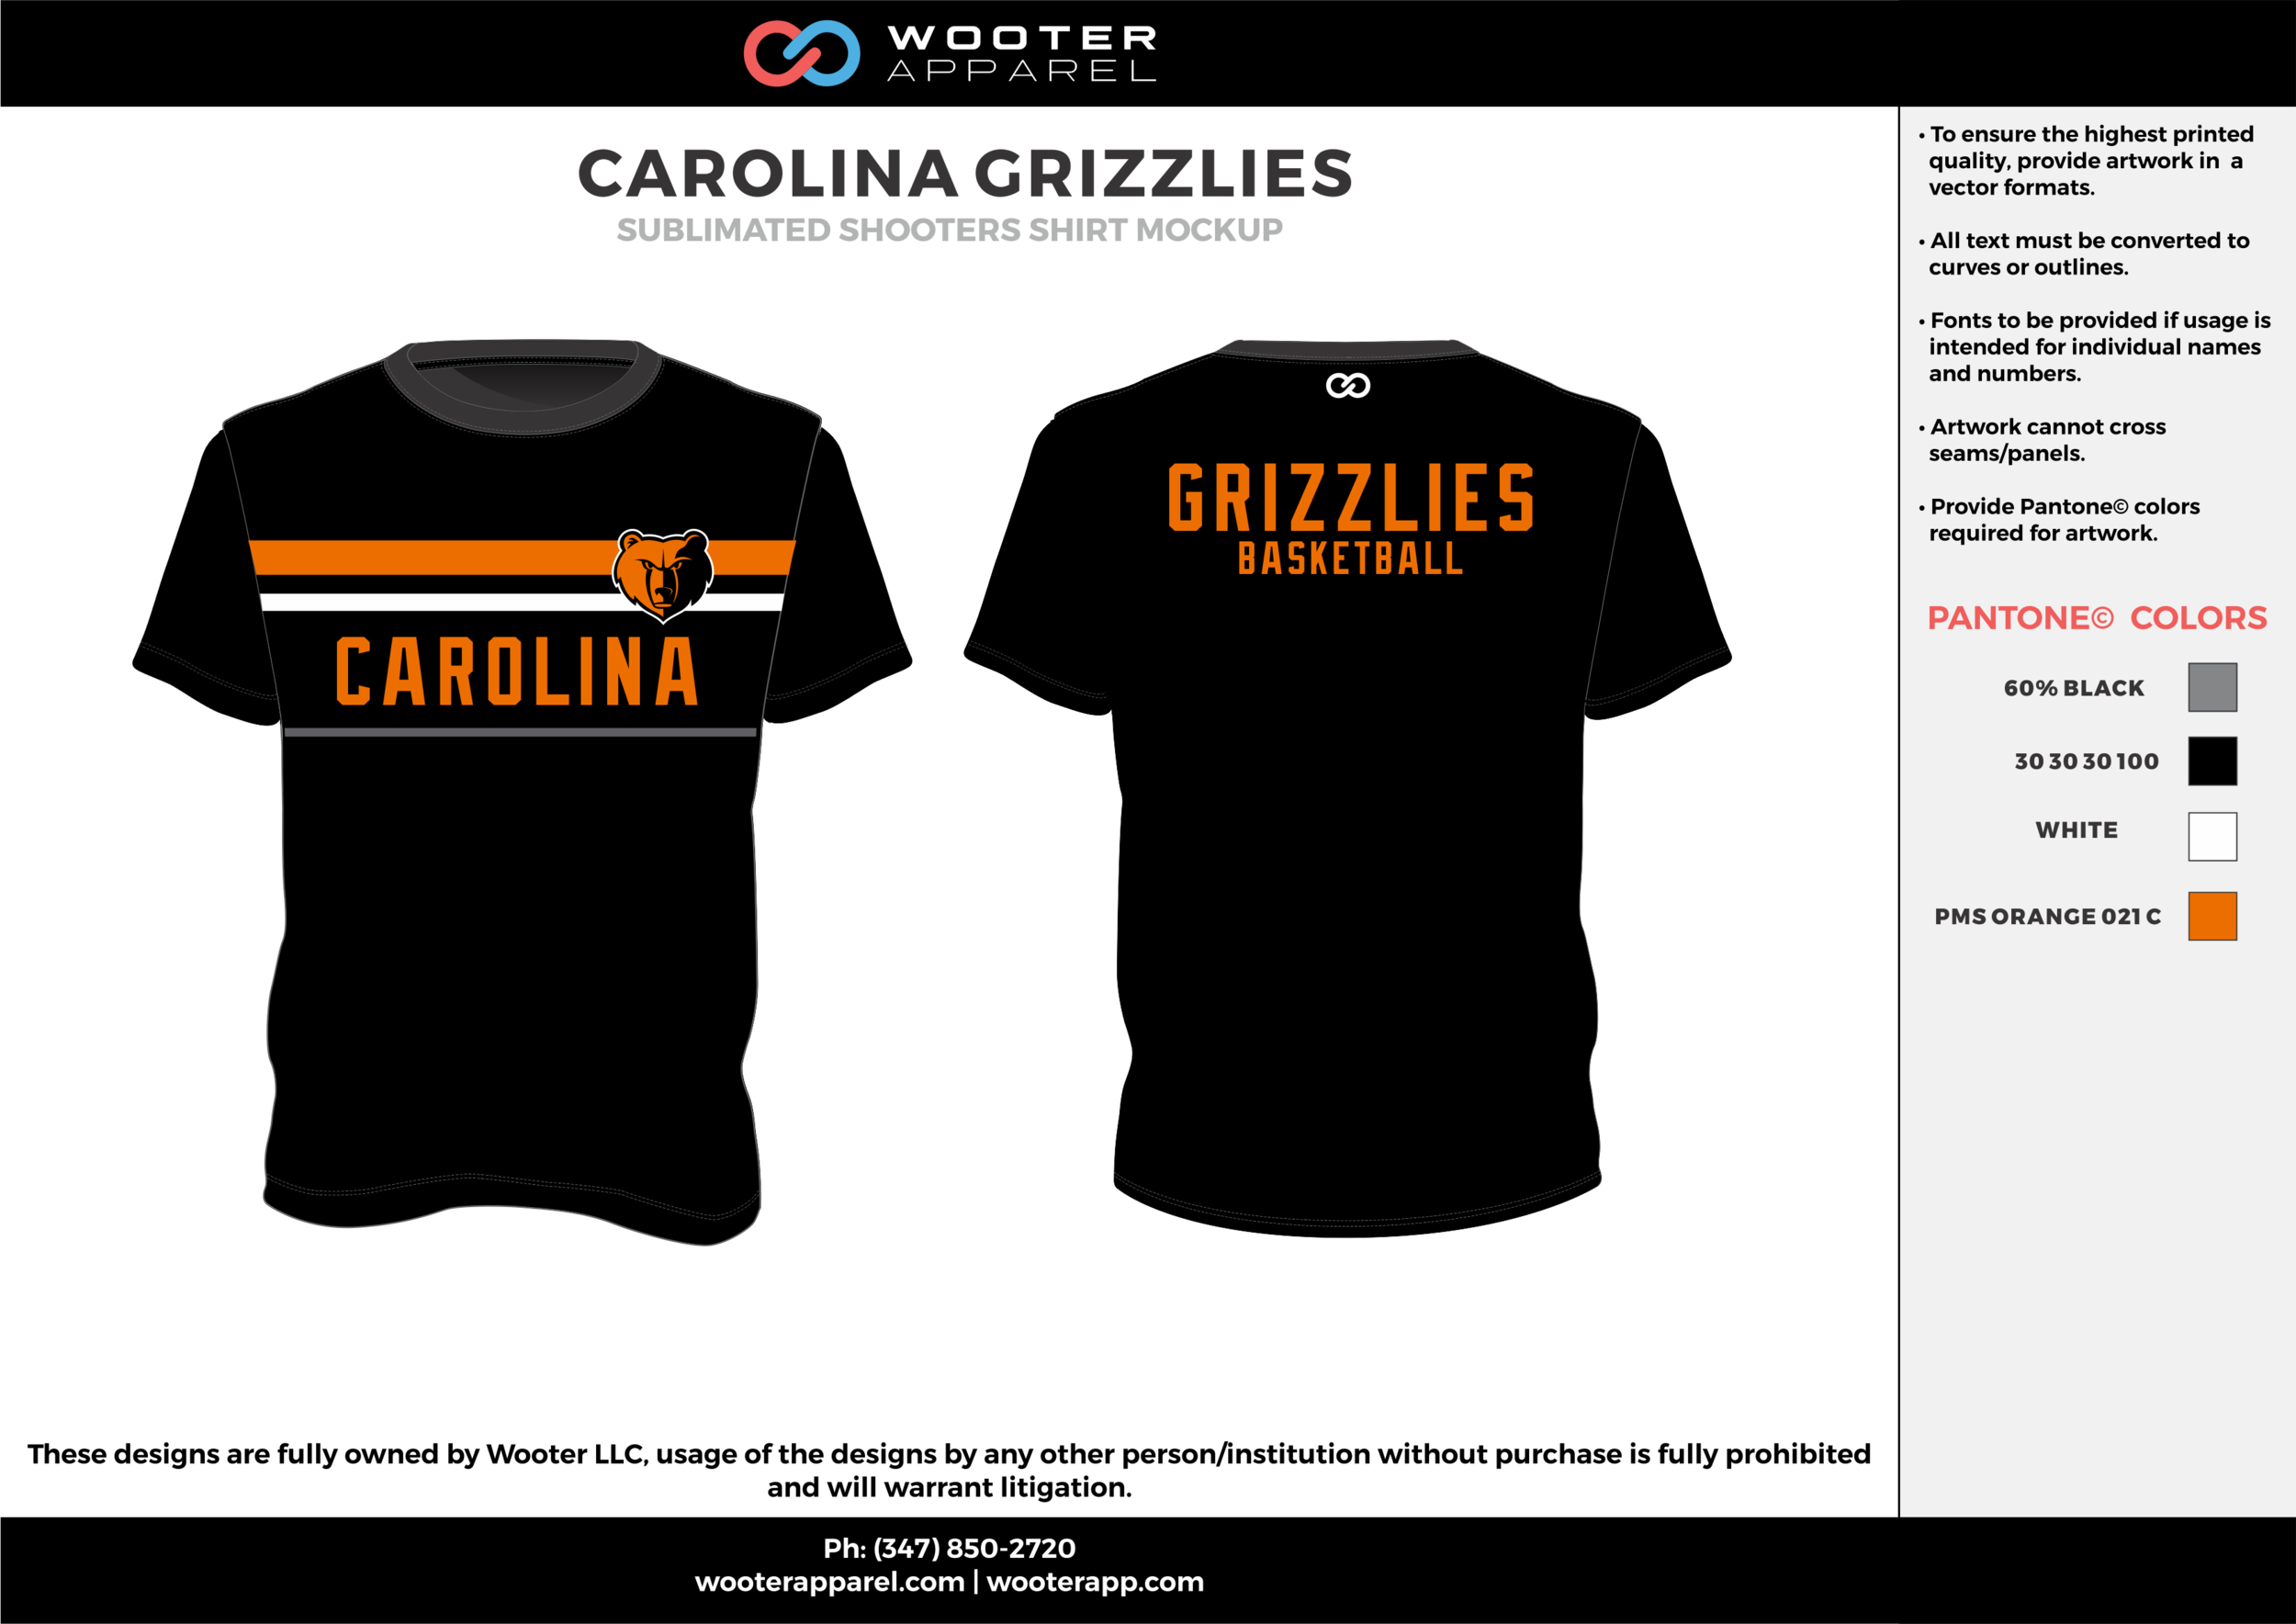 CAROLINA GRIZZLIES black gray orange white custom design t-shirts